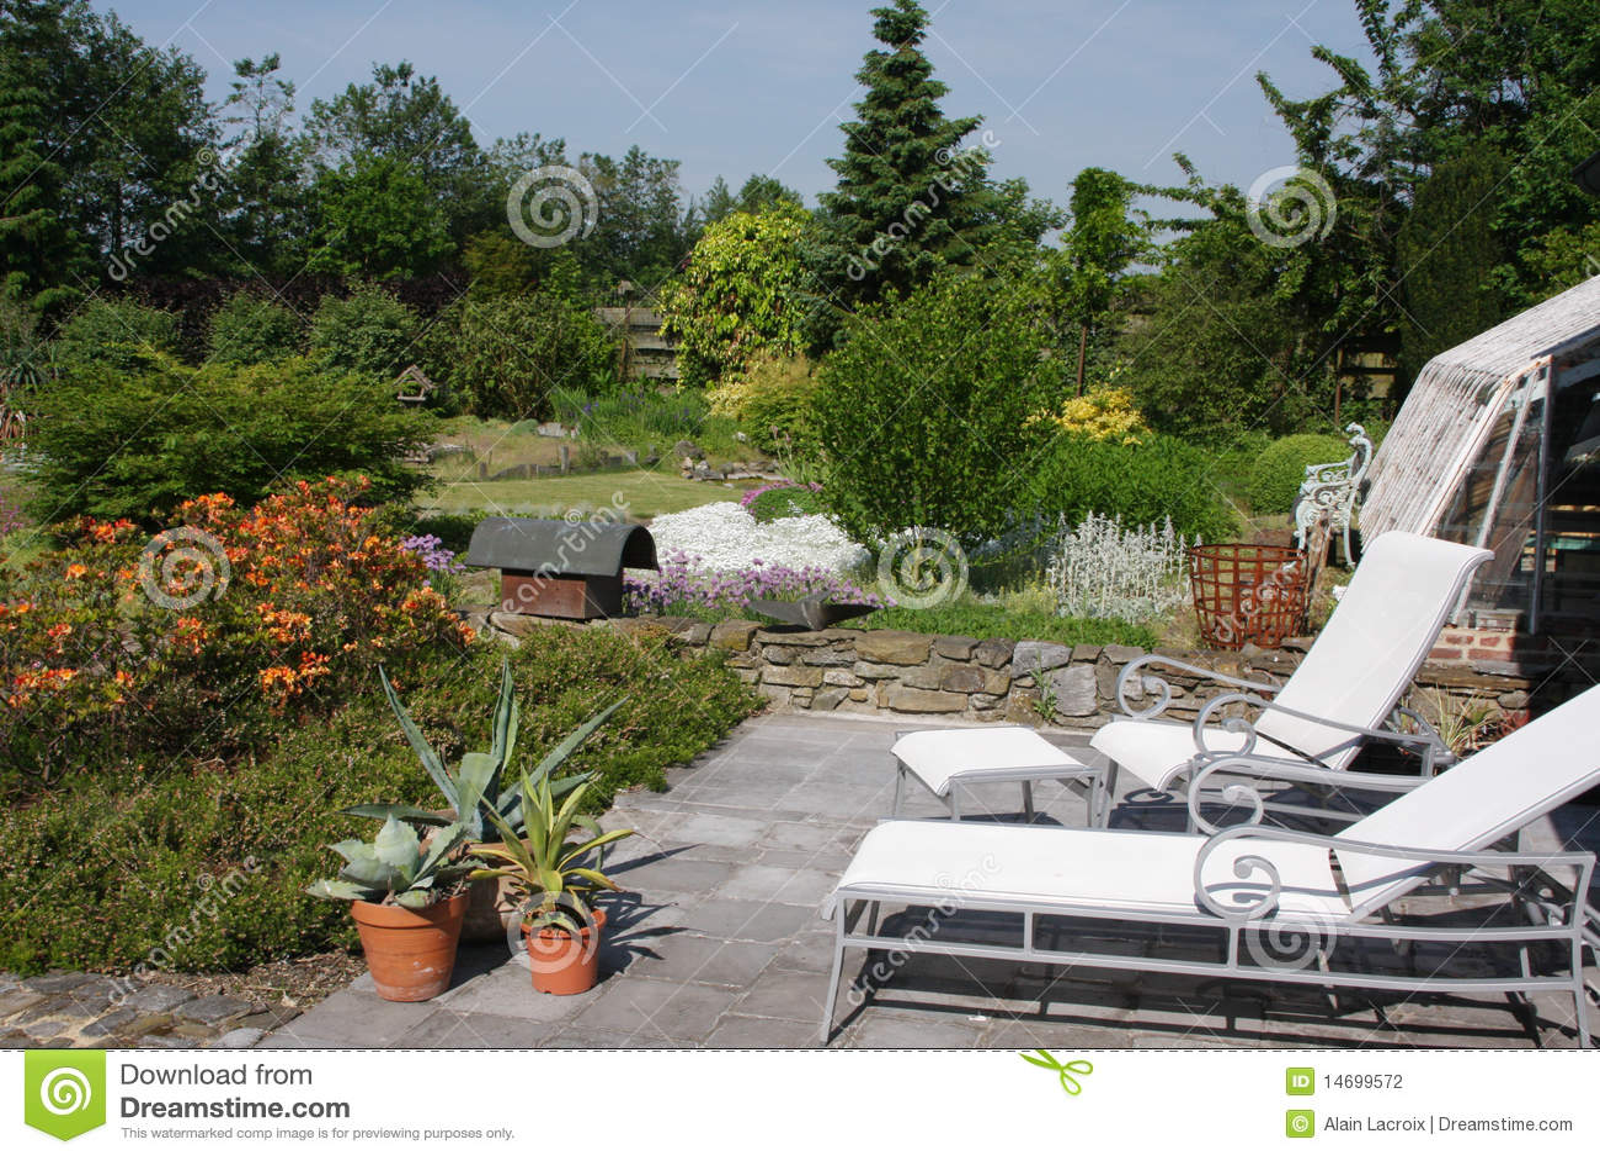 Garden relaxation